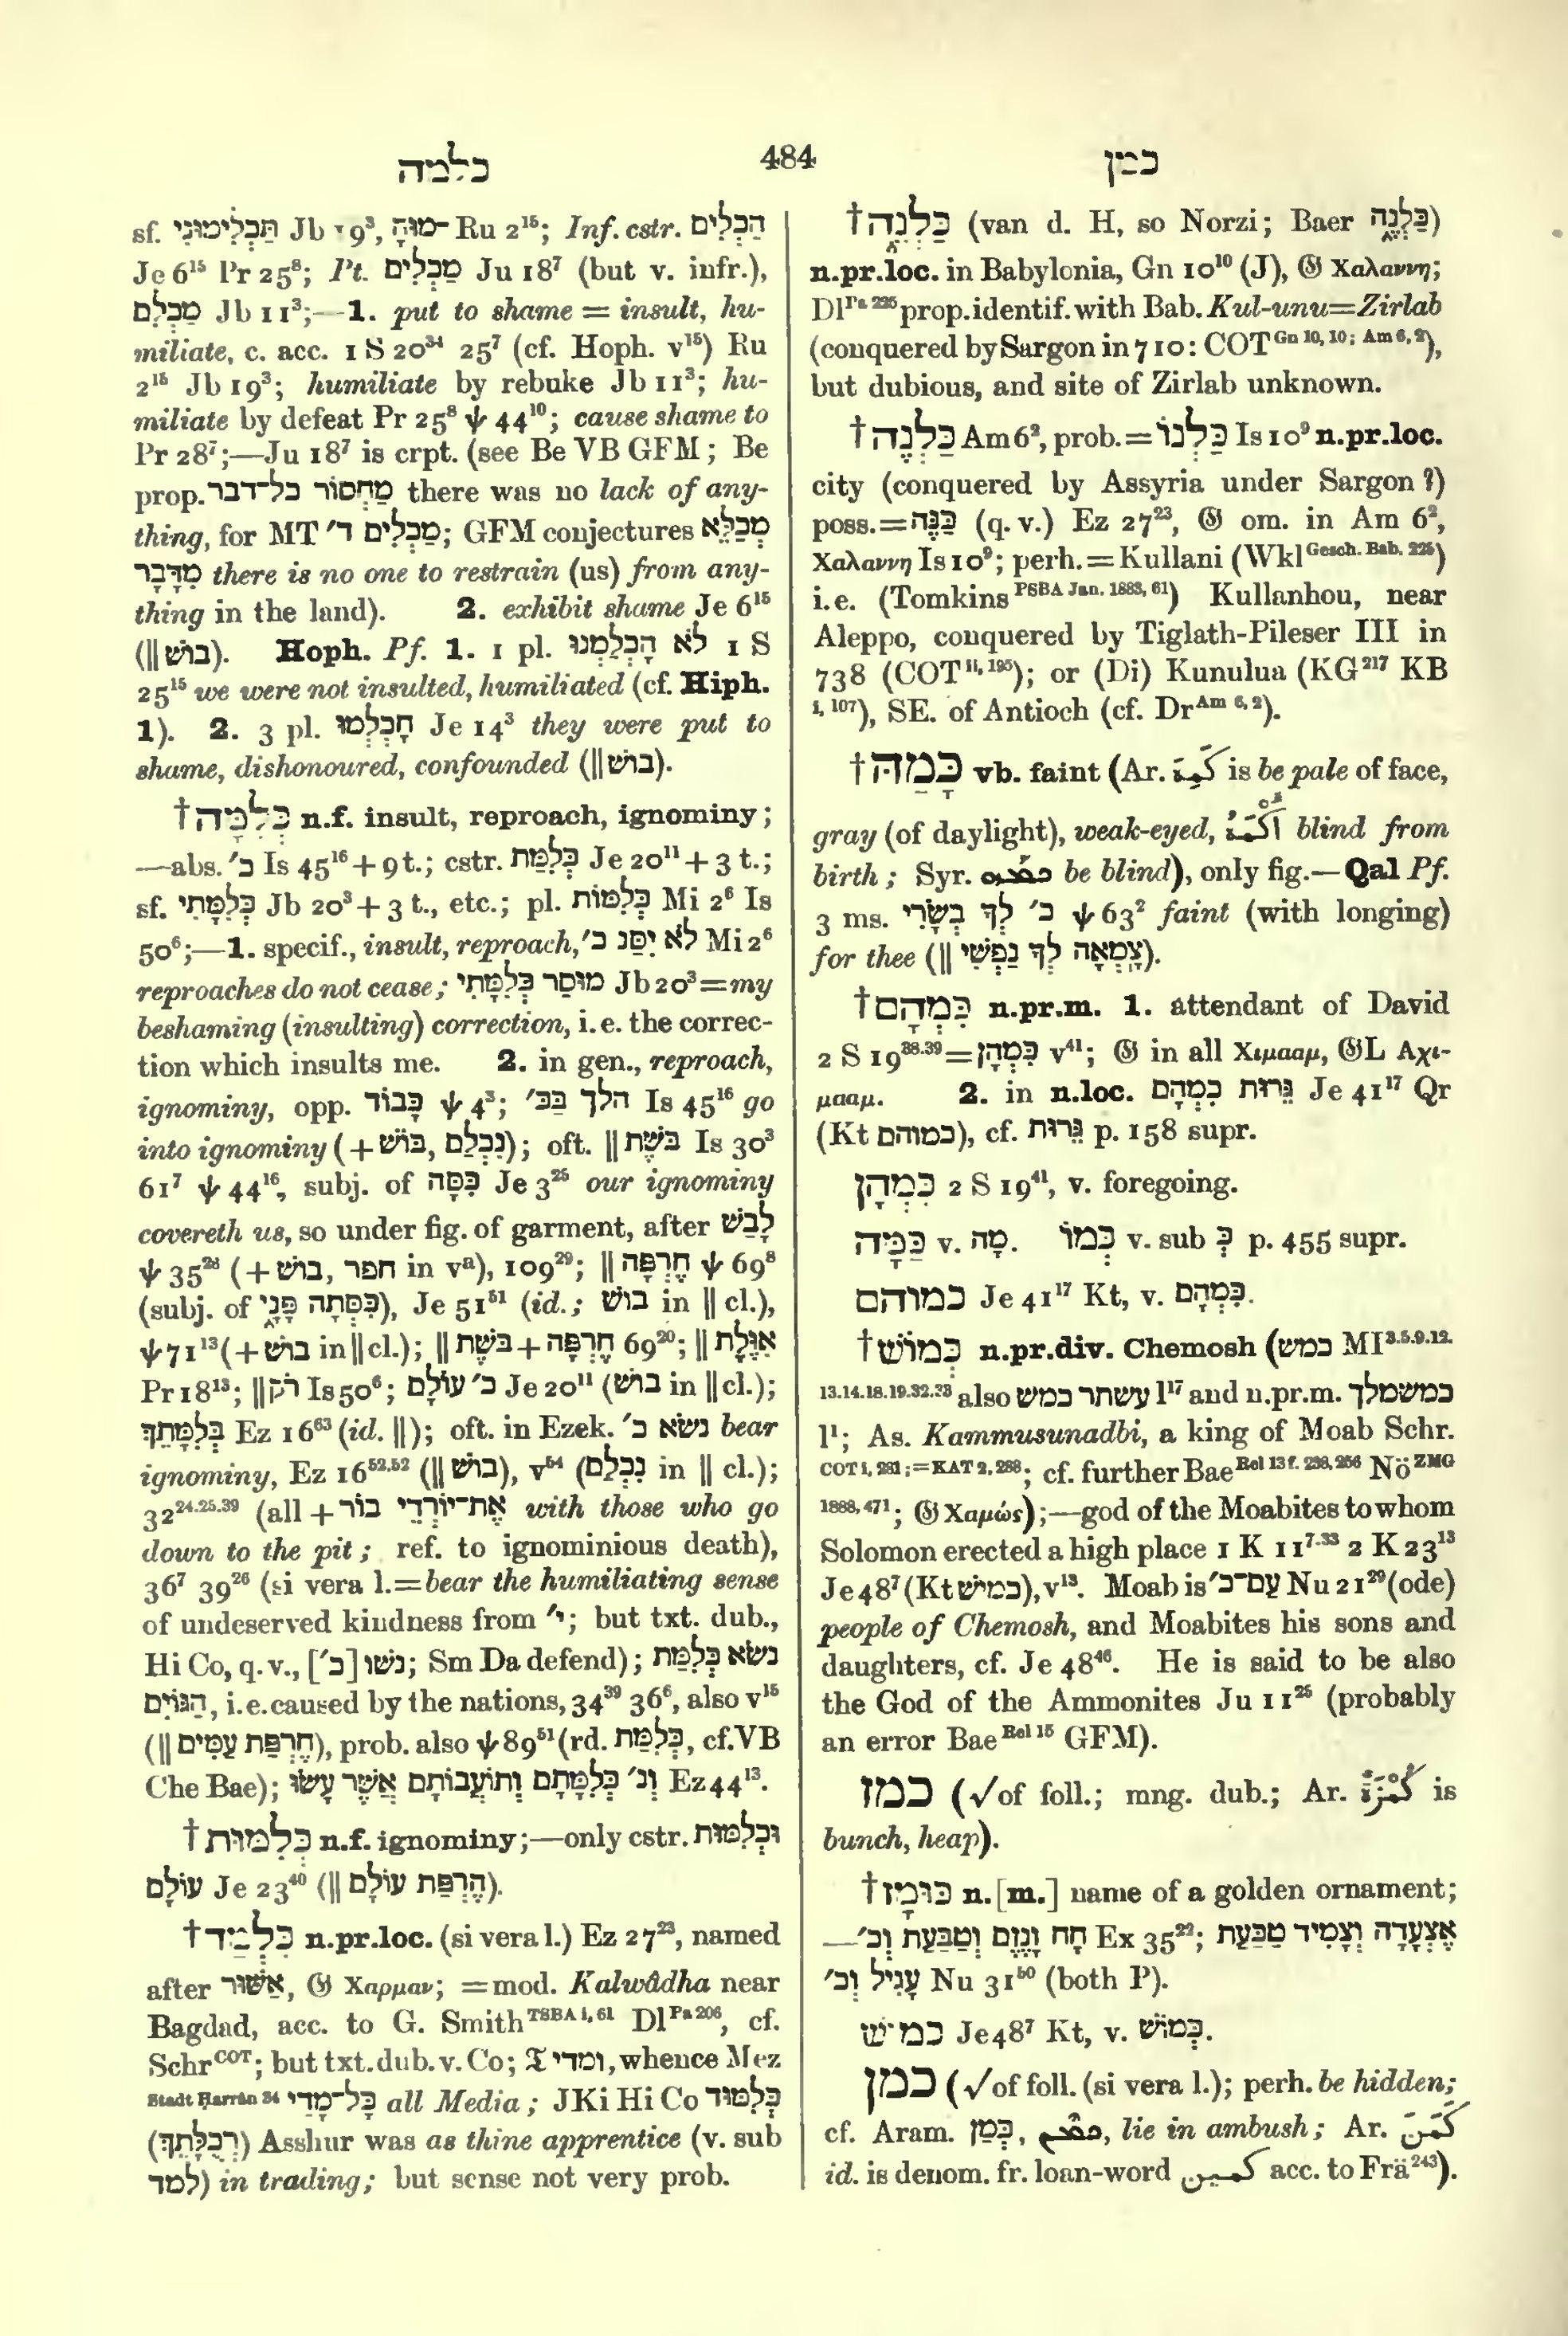 aram book by jayamohan pdf free download